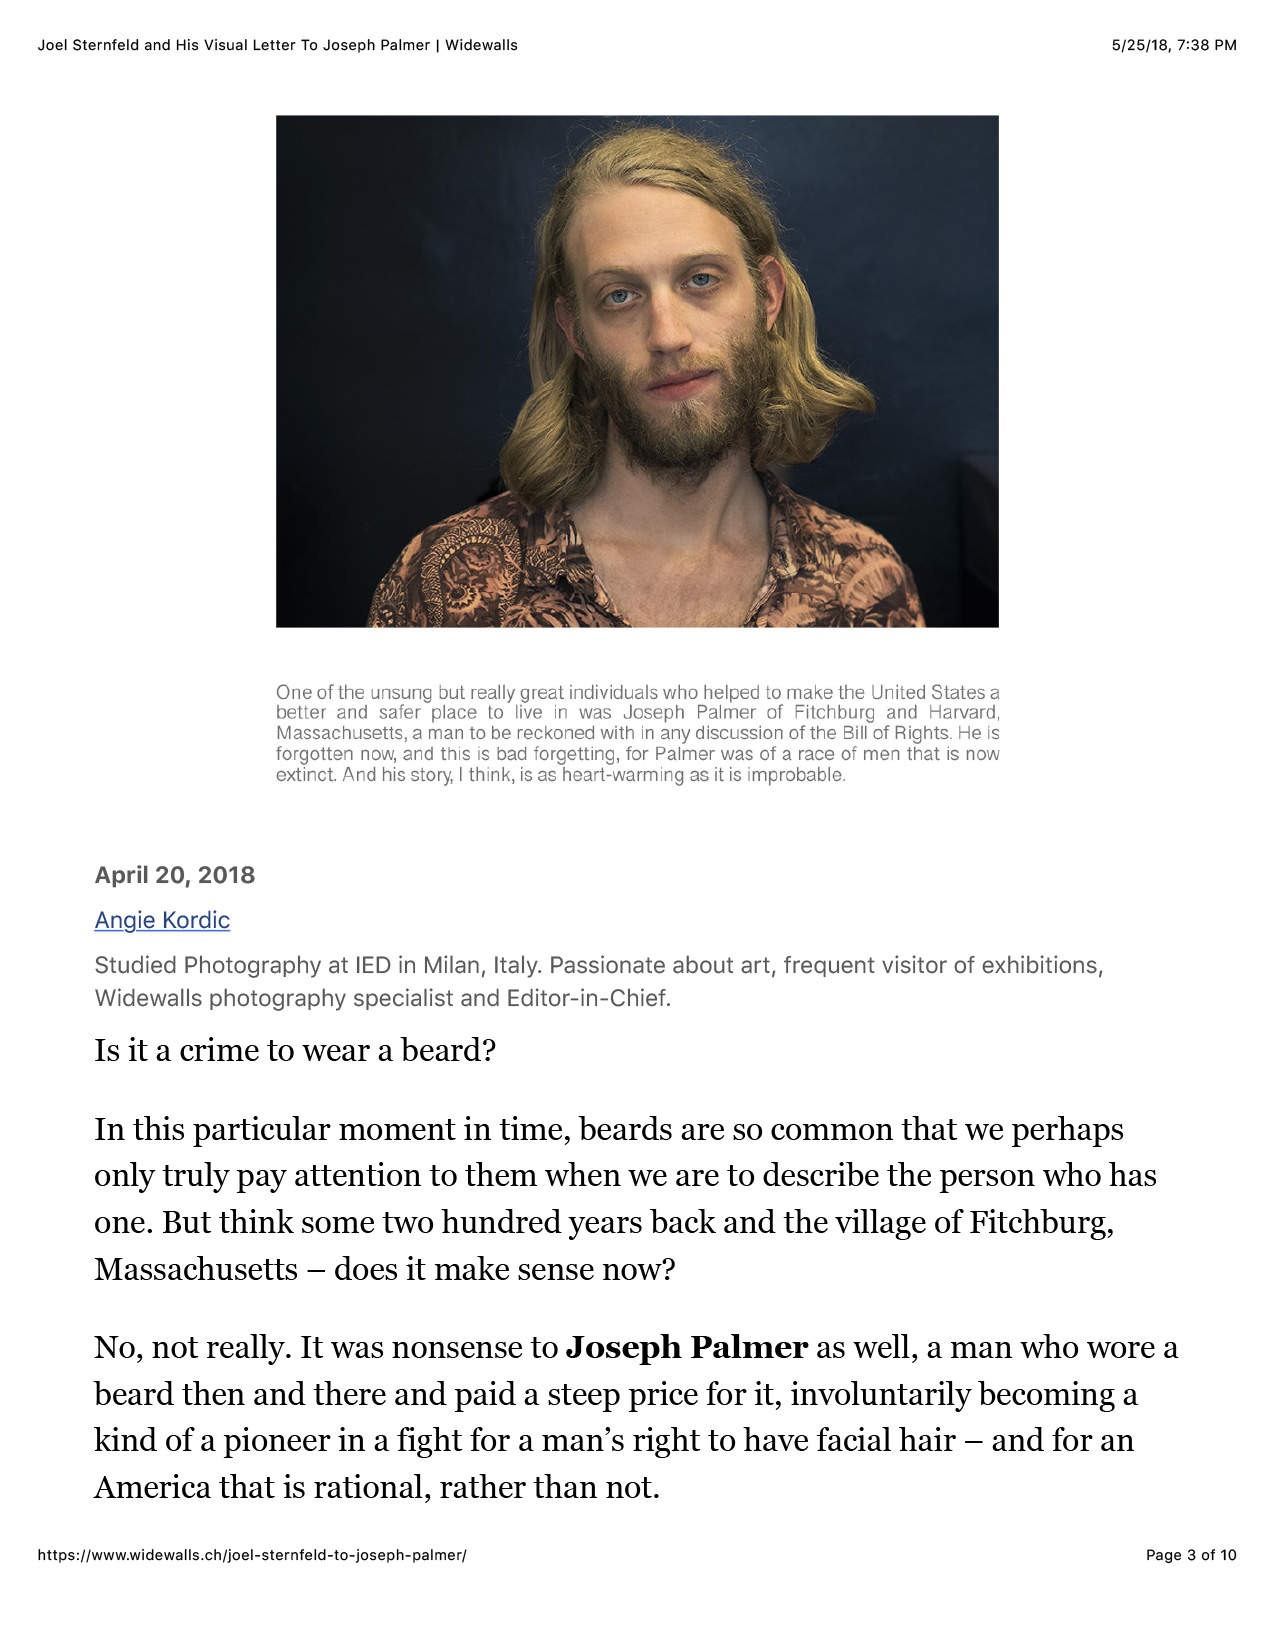 Joel-Sternfeld-and-His-Visual-Letter-To-Joseph-Palmer-_-Widewalls-3.jpg